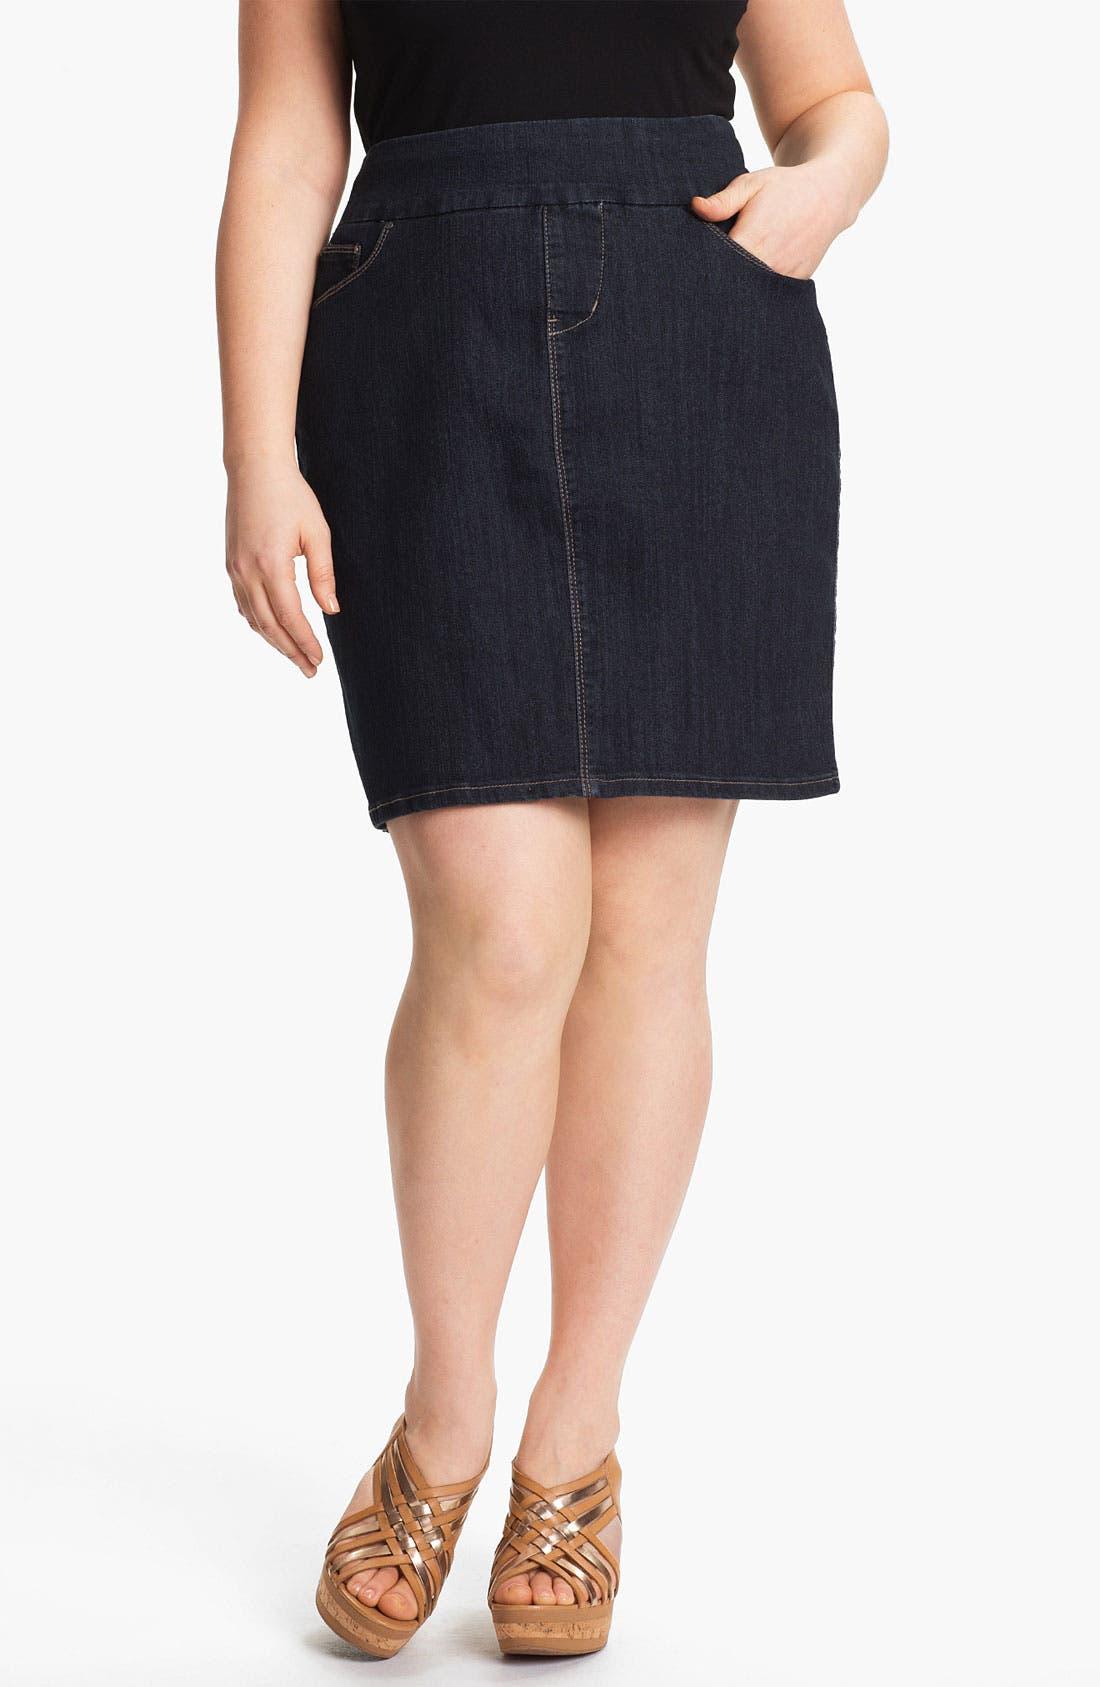 Alternate Image 1 Selected - Jag Jeans 'Maddock' Denim Skirt (Plus Size) (Online Only)